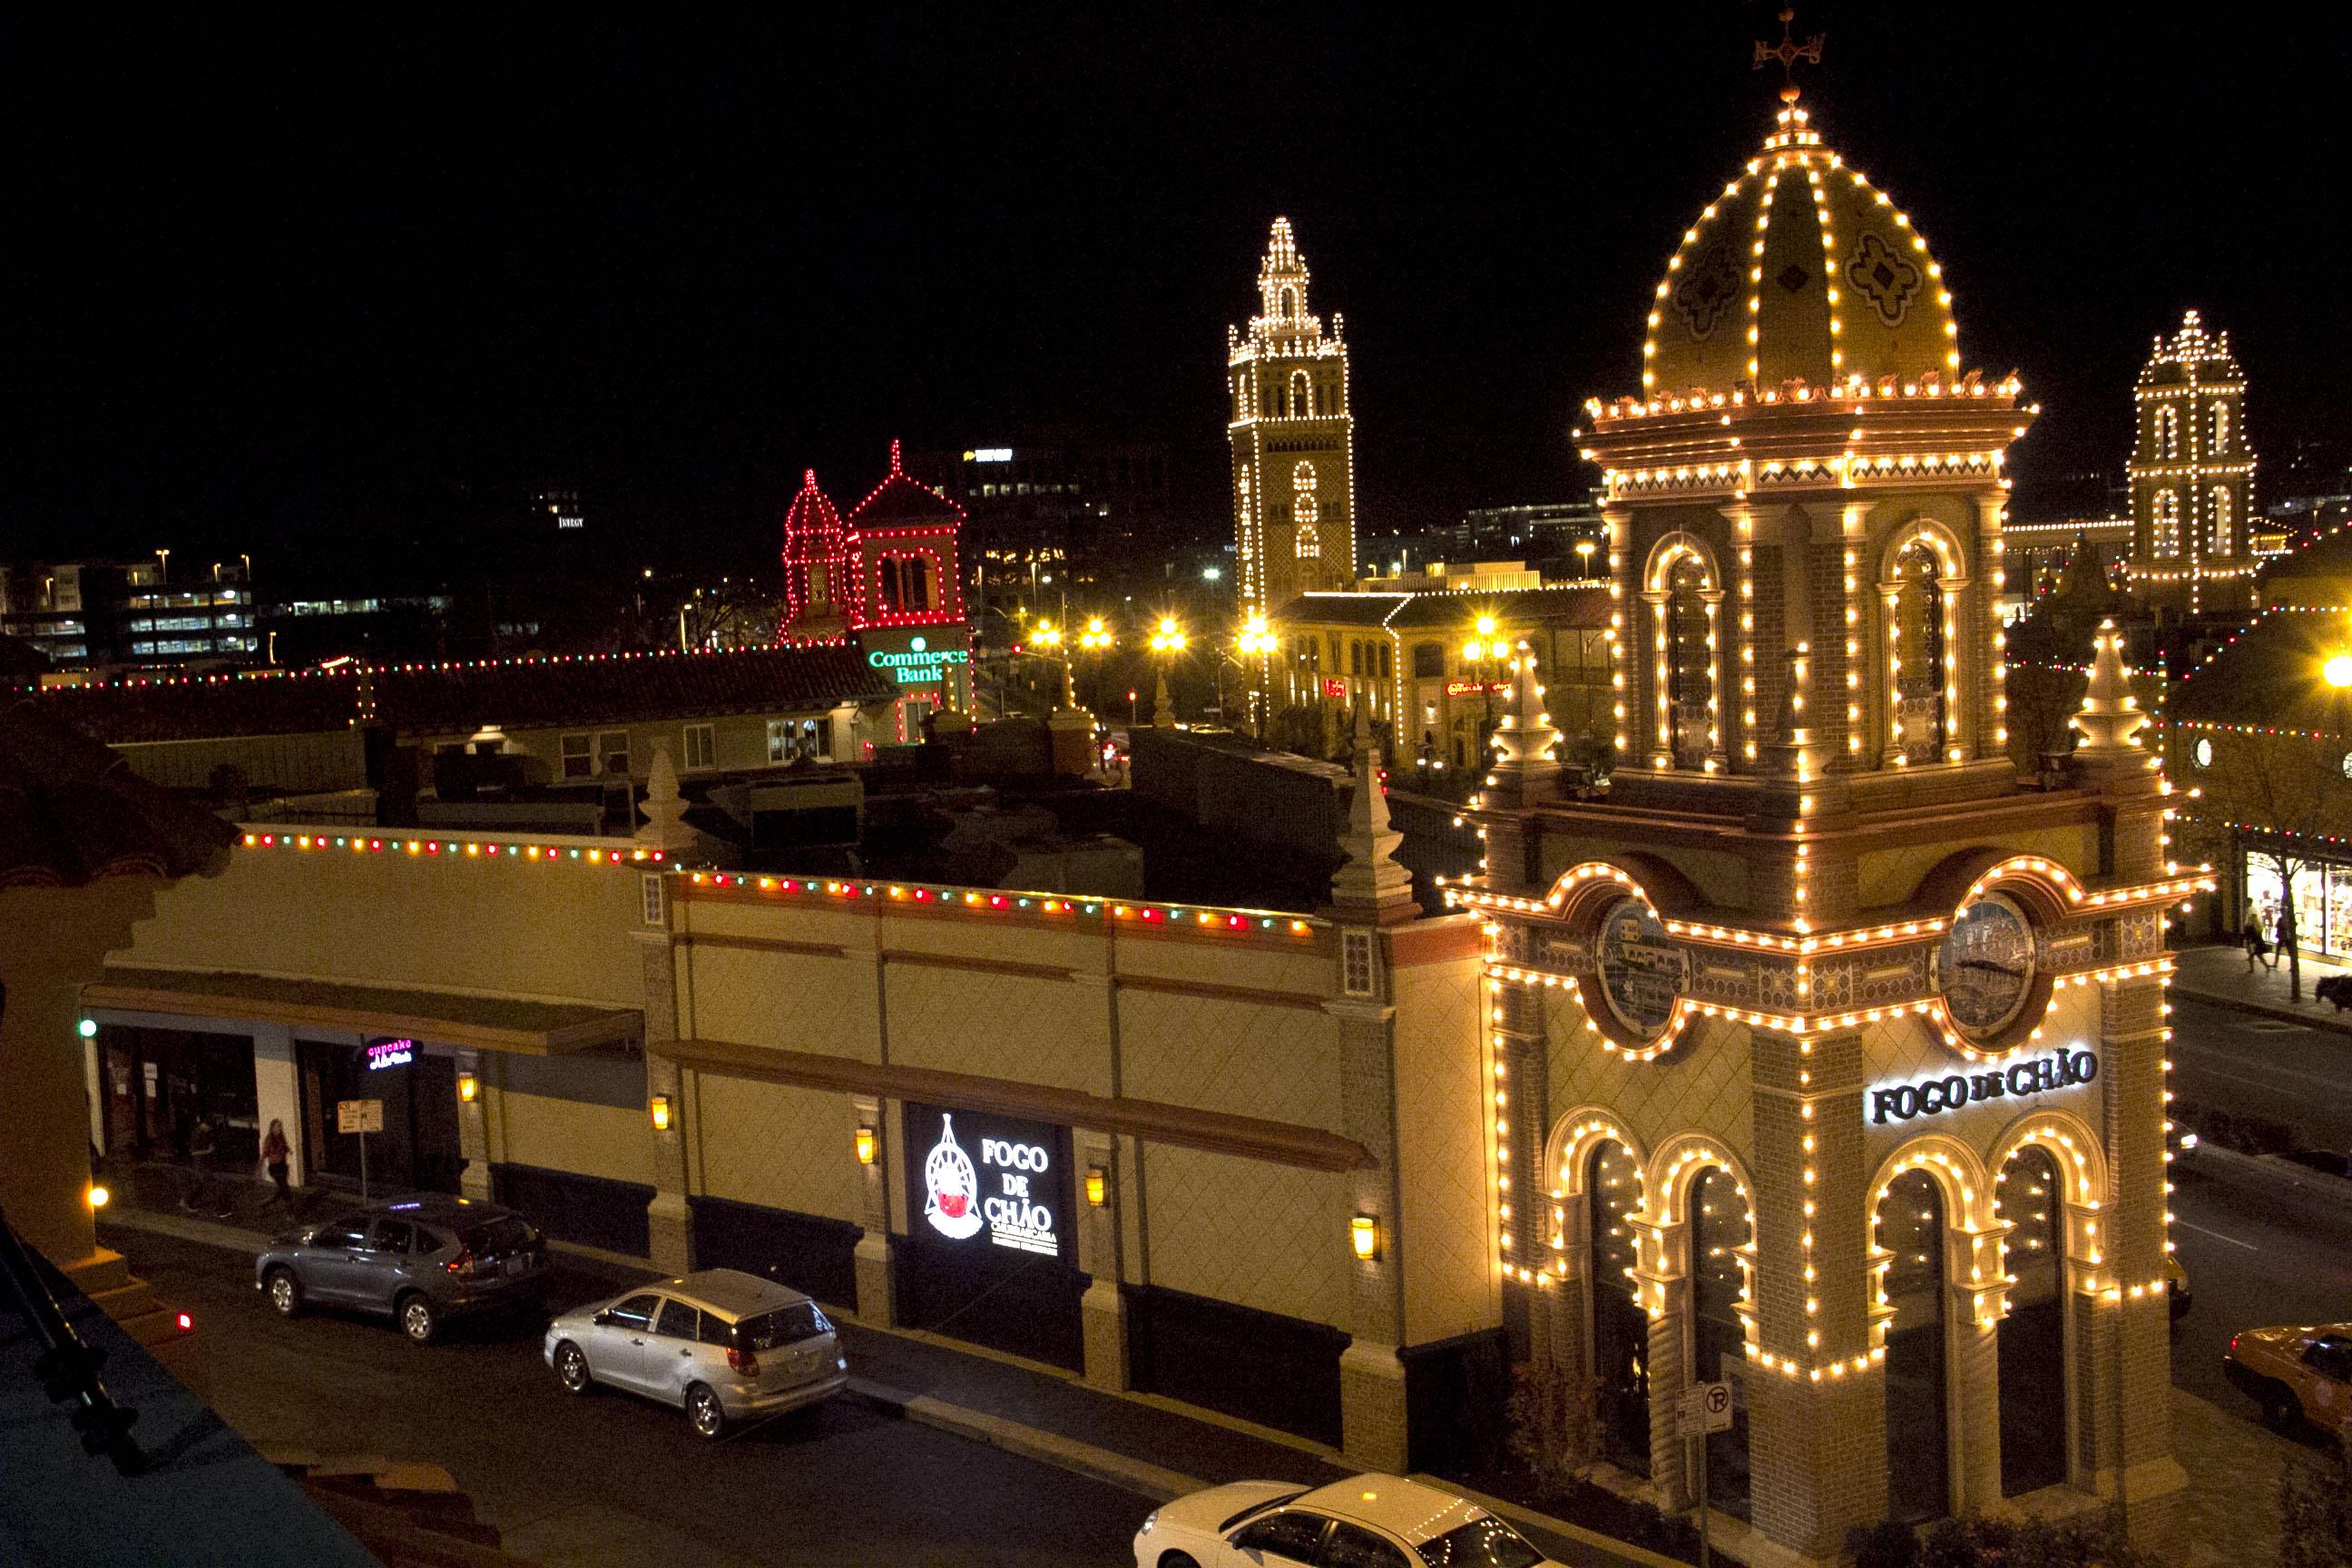 Lighting Up The Night Annual Country Club Plaza Lighting